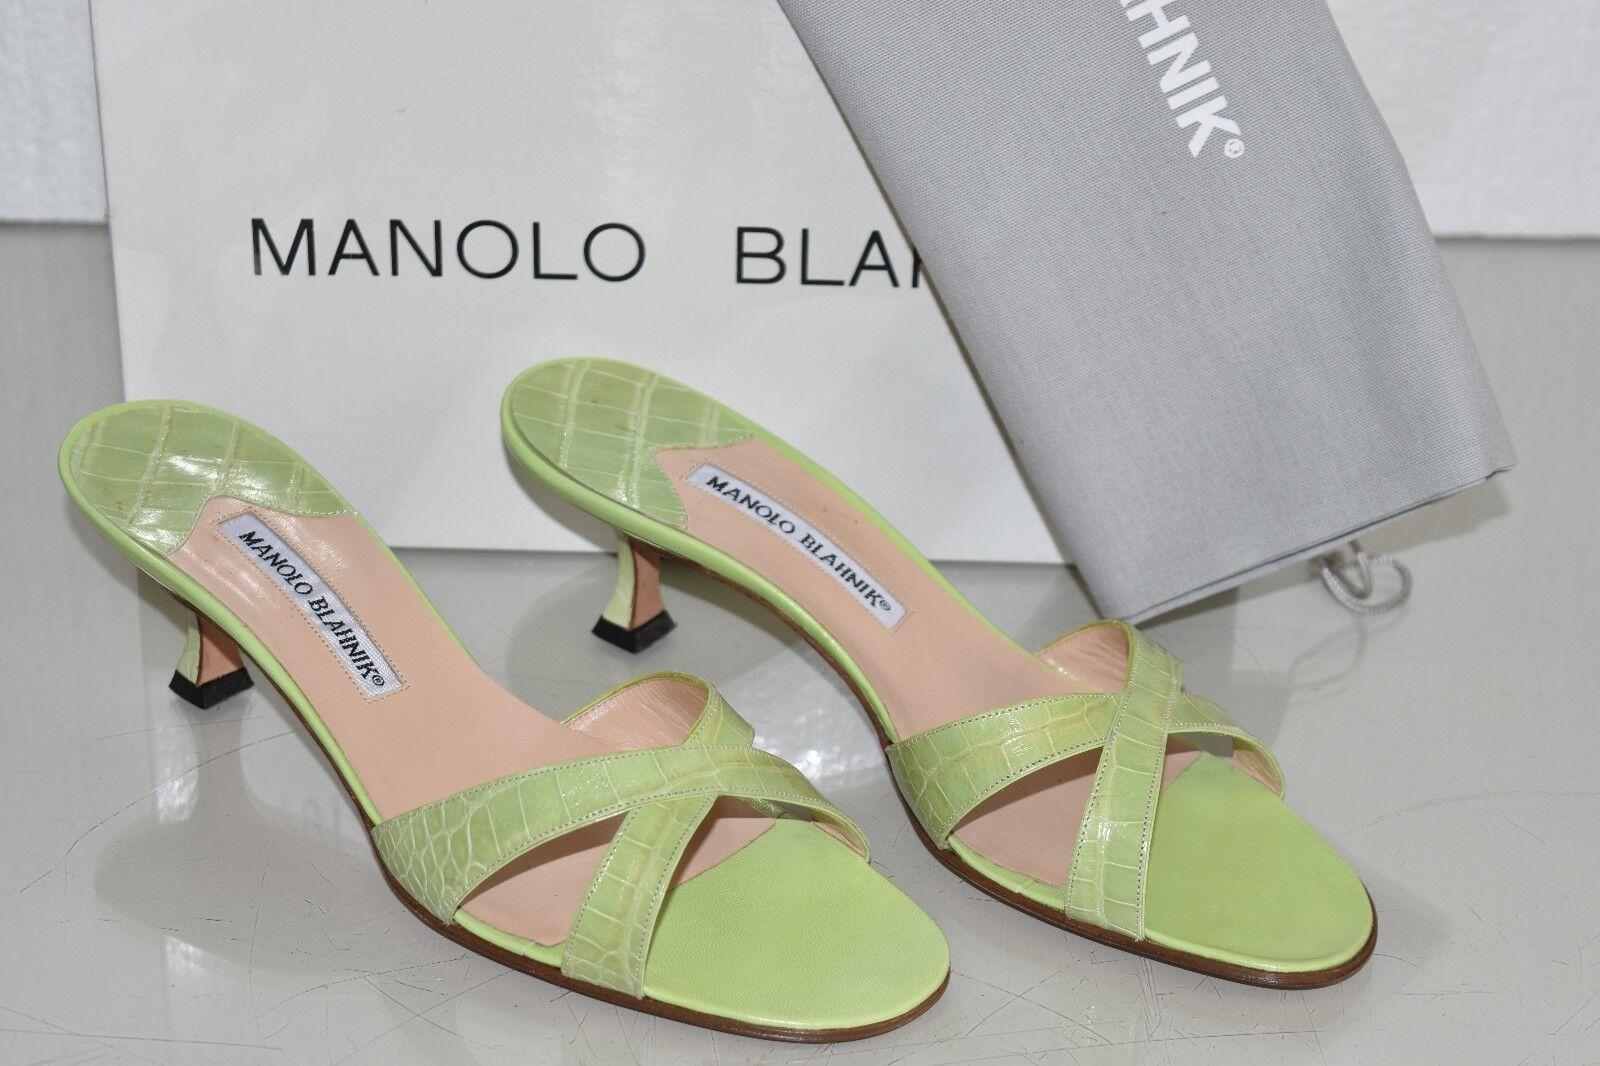 2625 2625 2625 ny Manolo Blahnik CallAMU grön ALLIGATOR CROCODILE Sandals skor 39.5  bästa kvalitet bästa pris